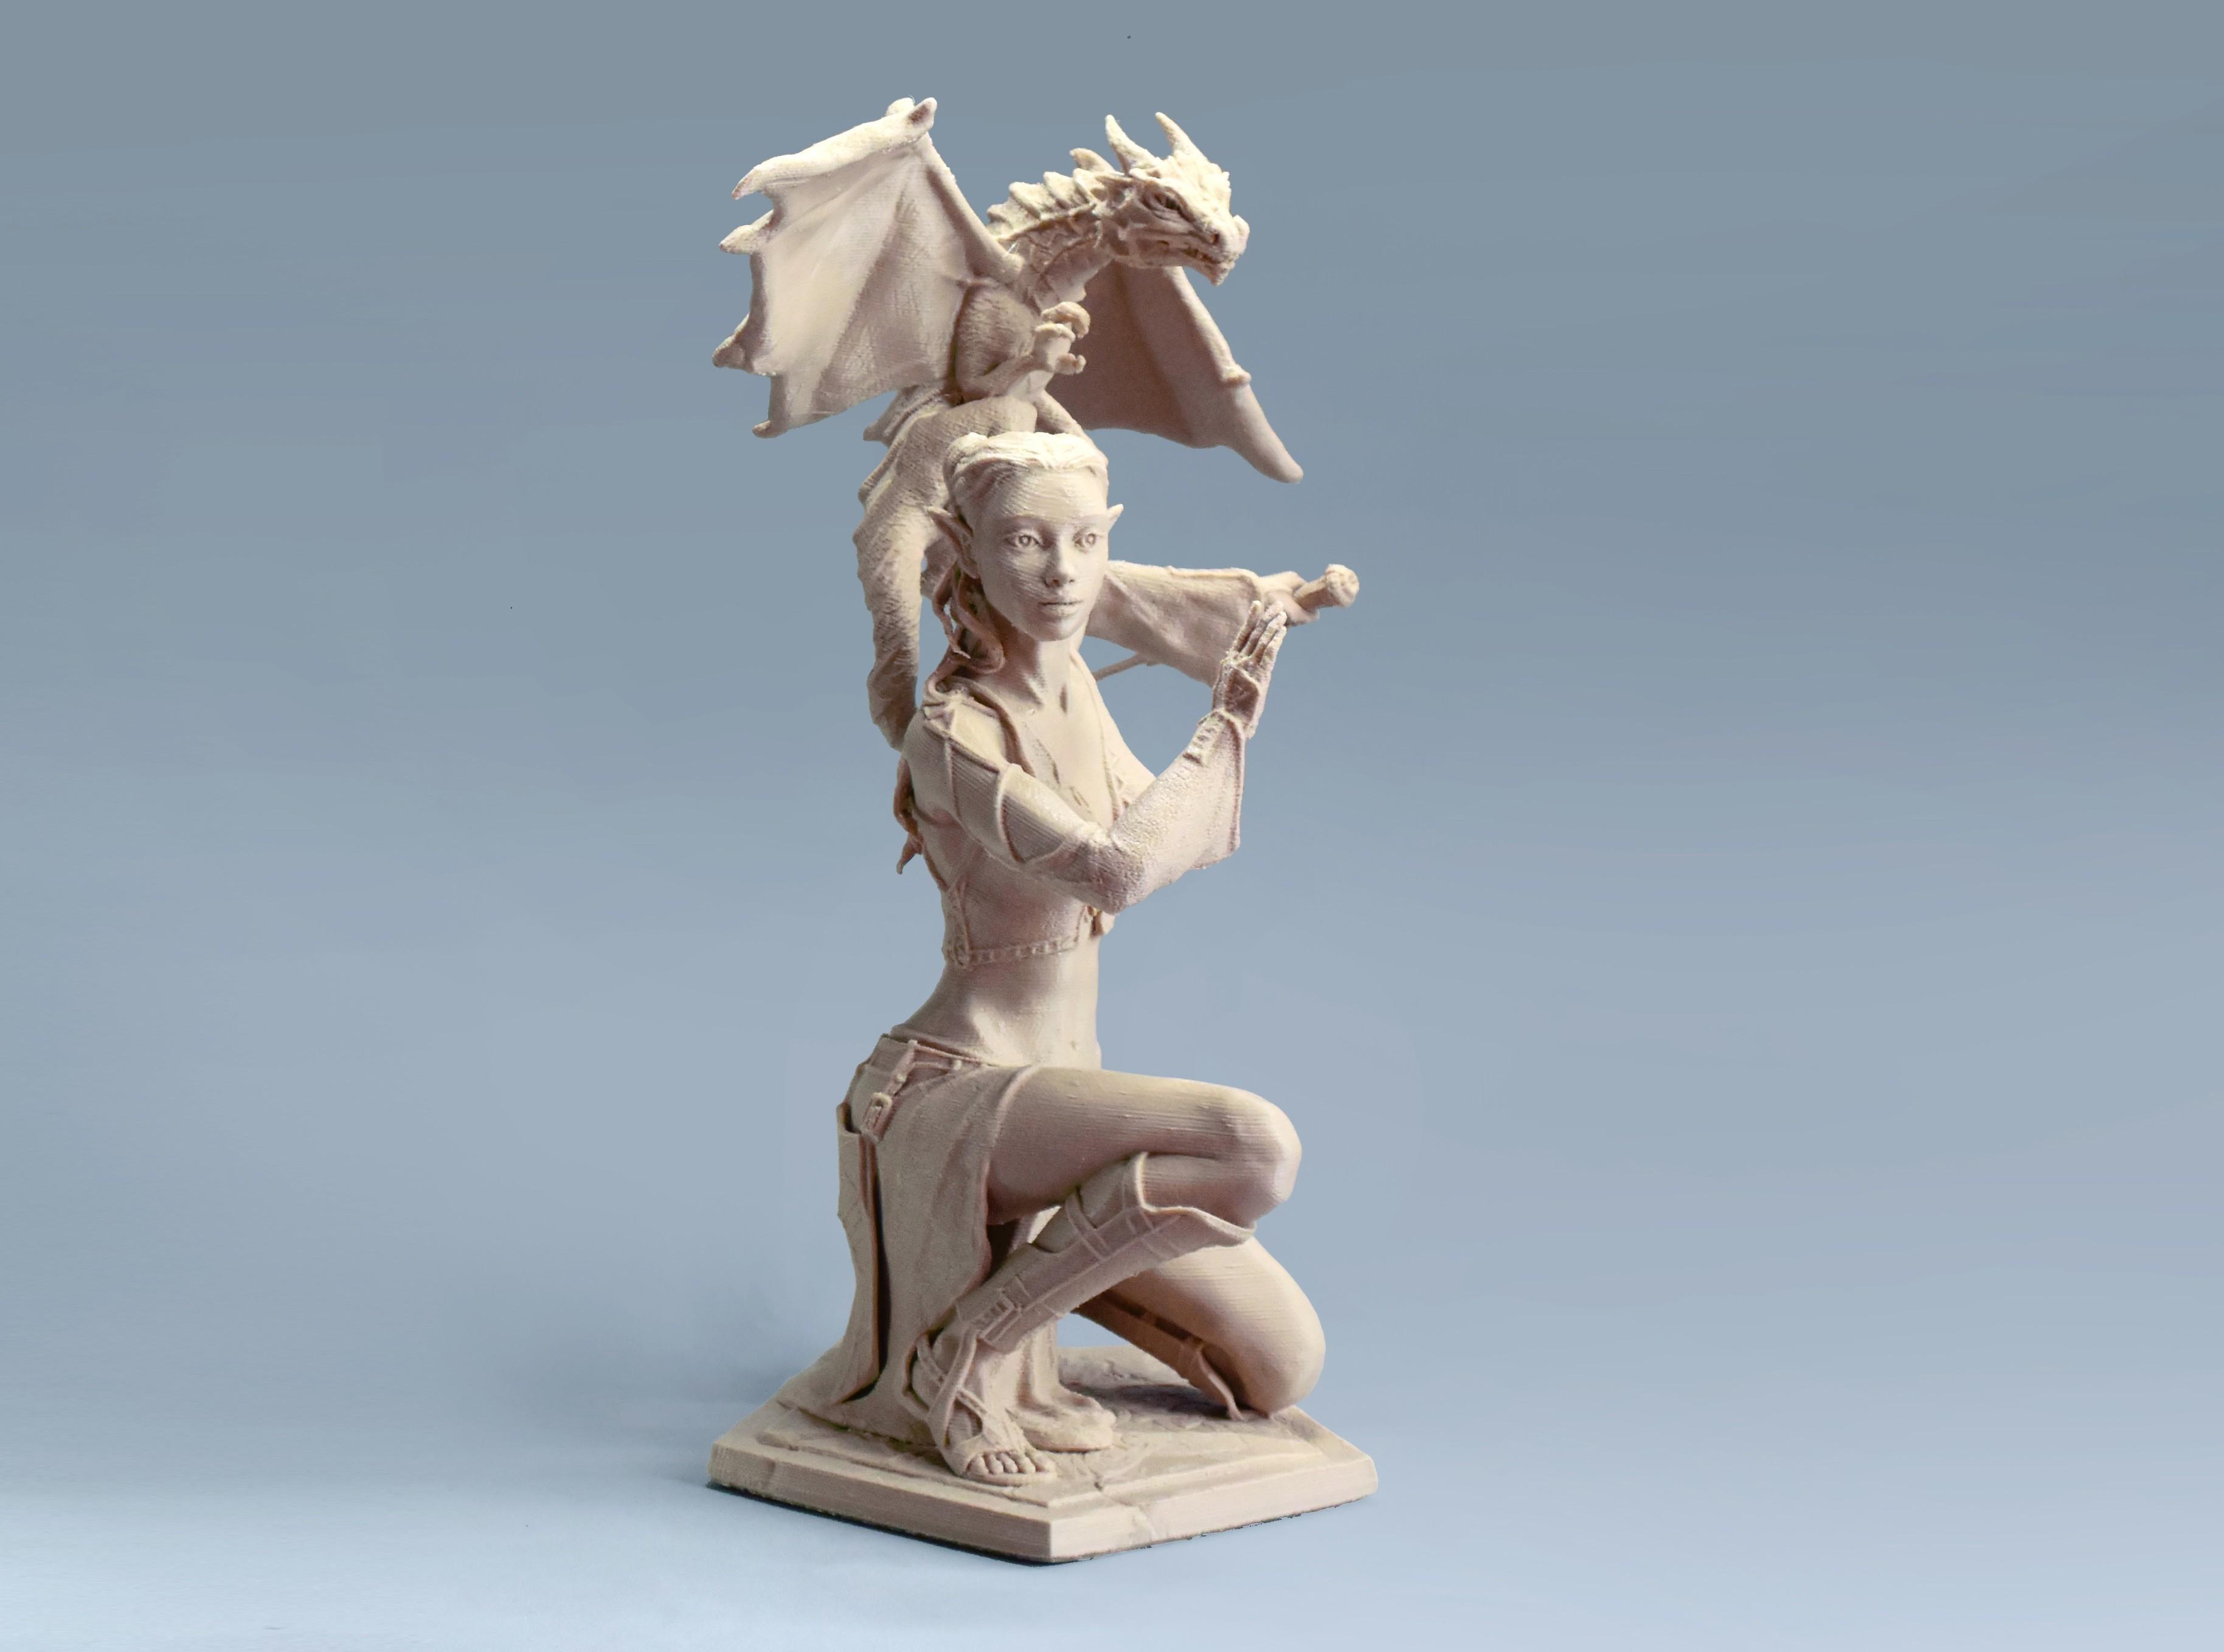 05  da DSC_7353p.jpg Download STL file Woman and Dragon • 3D printable design, Shira